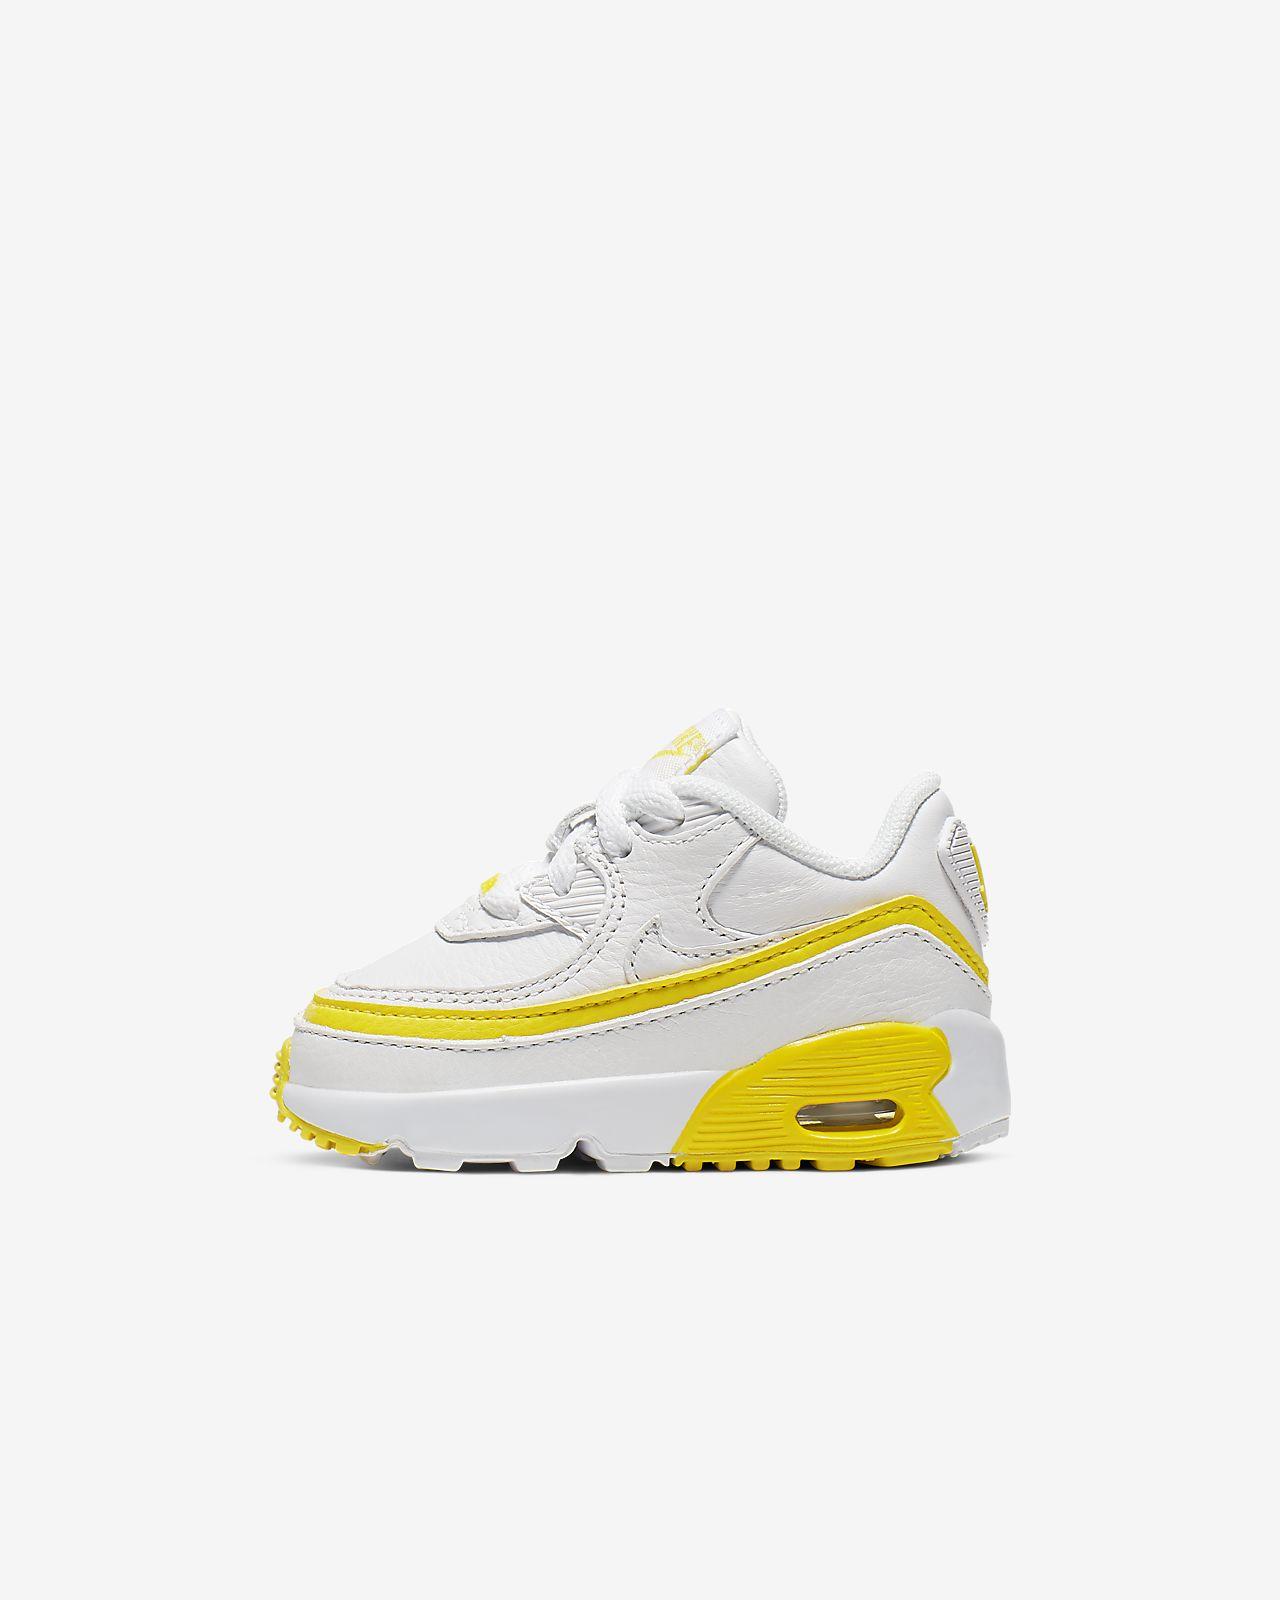 Nike Air Max 90/UNDFTD BT 婴童运动童鞋